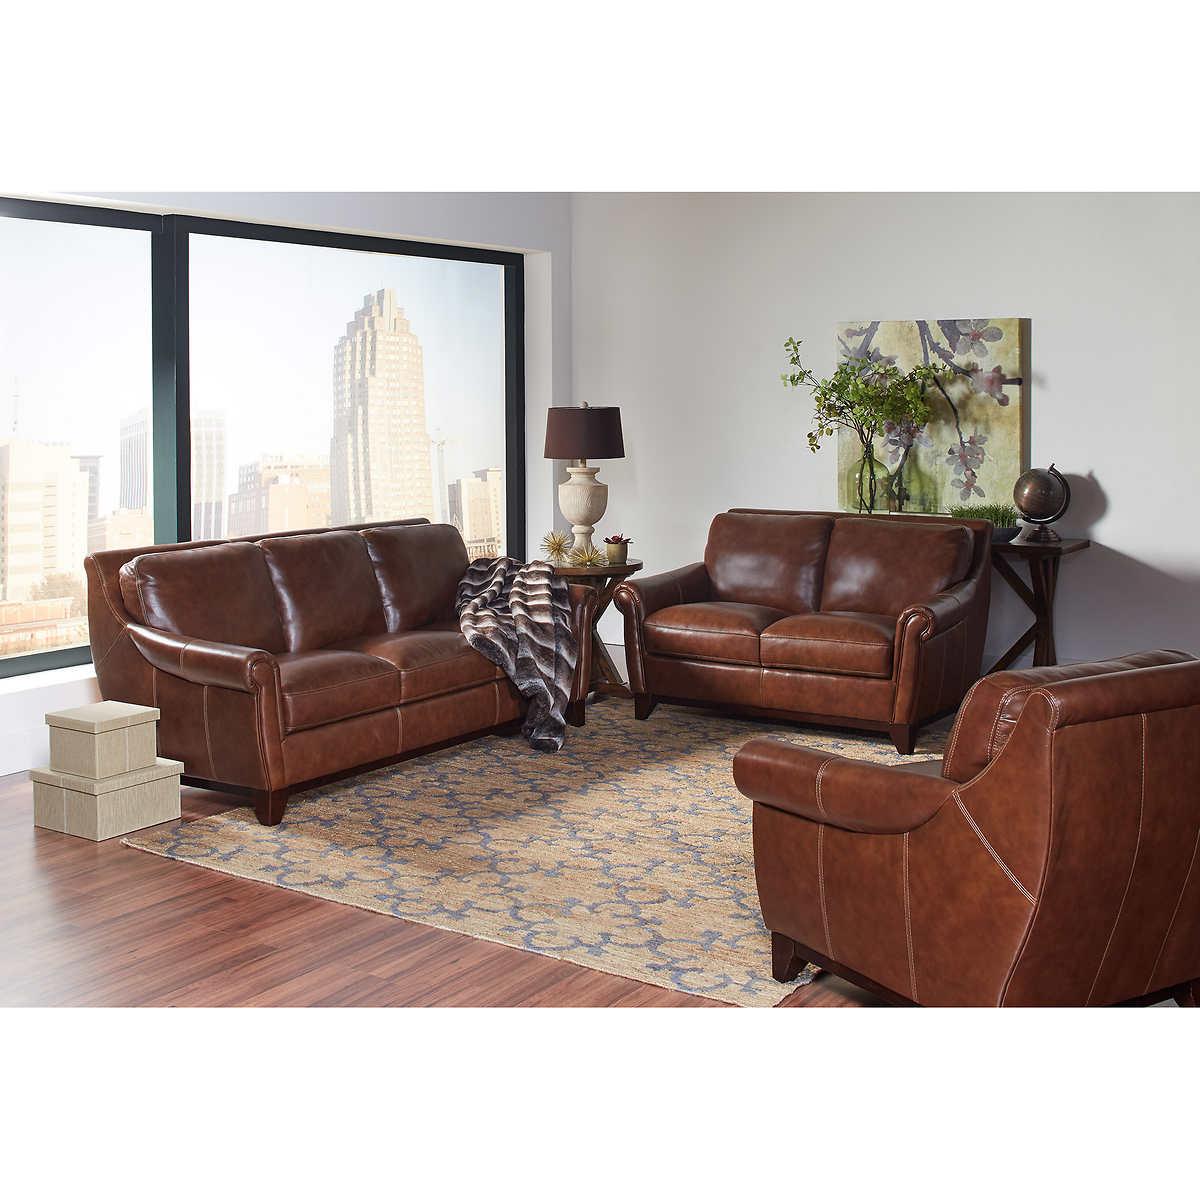 leather living room sets costco crofton 3 piece top grain leather living room set